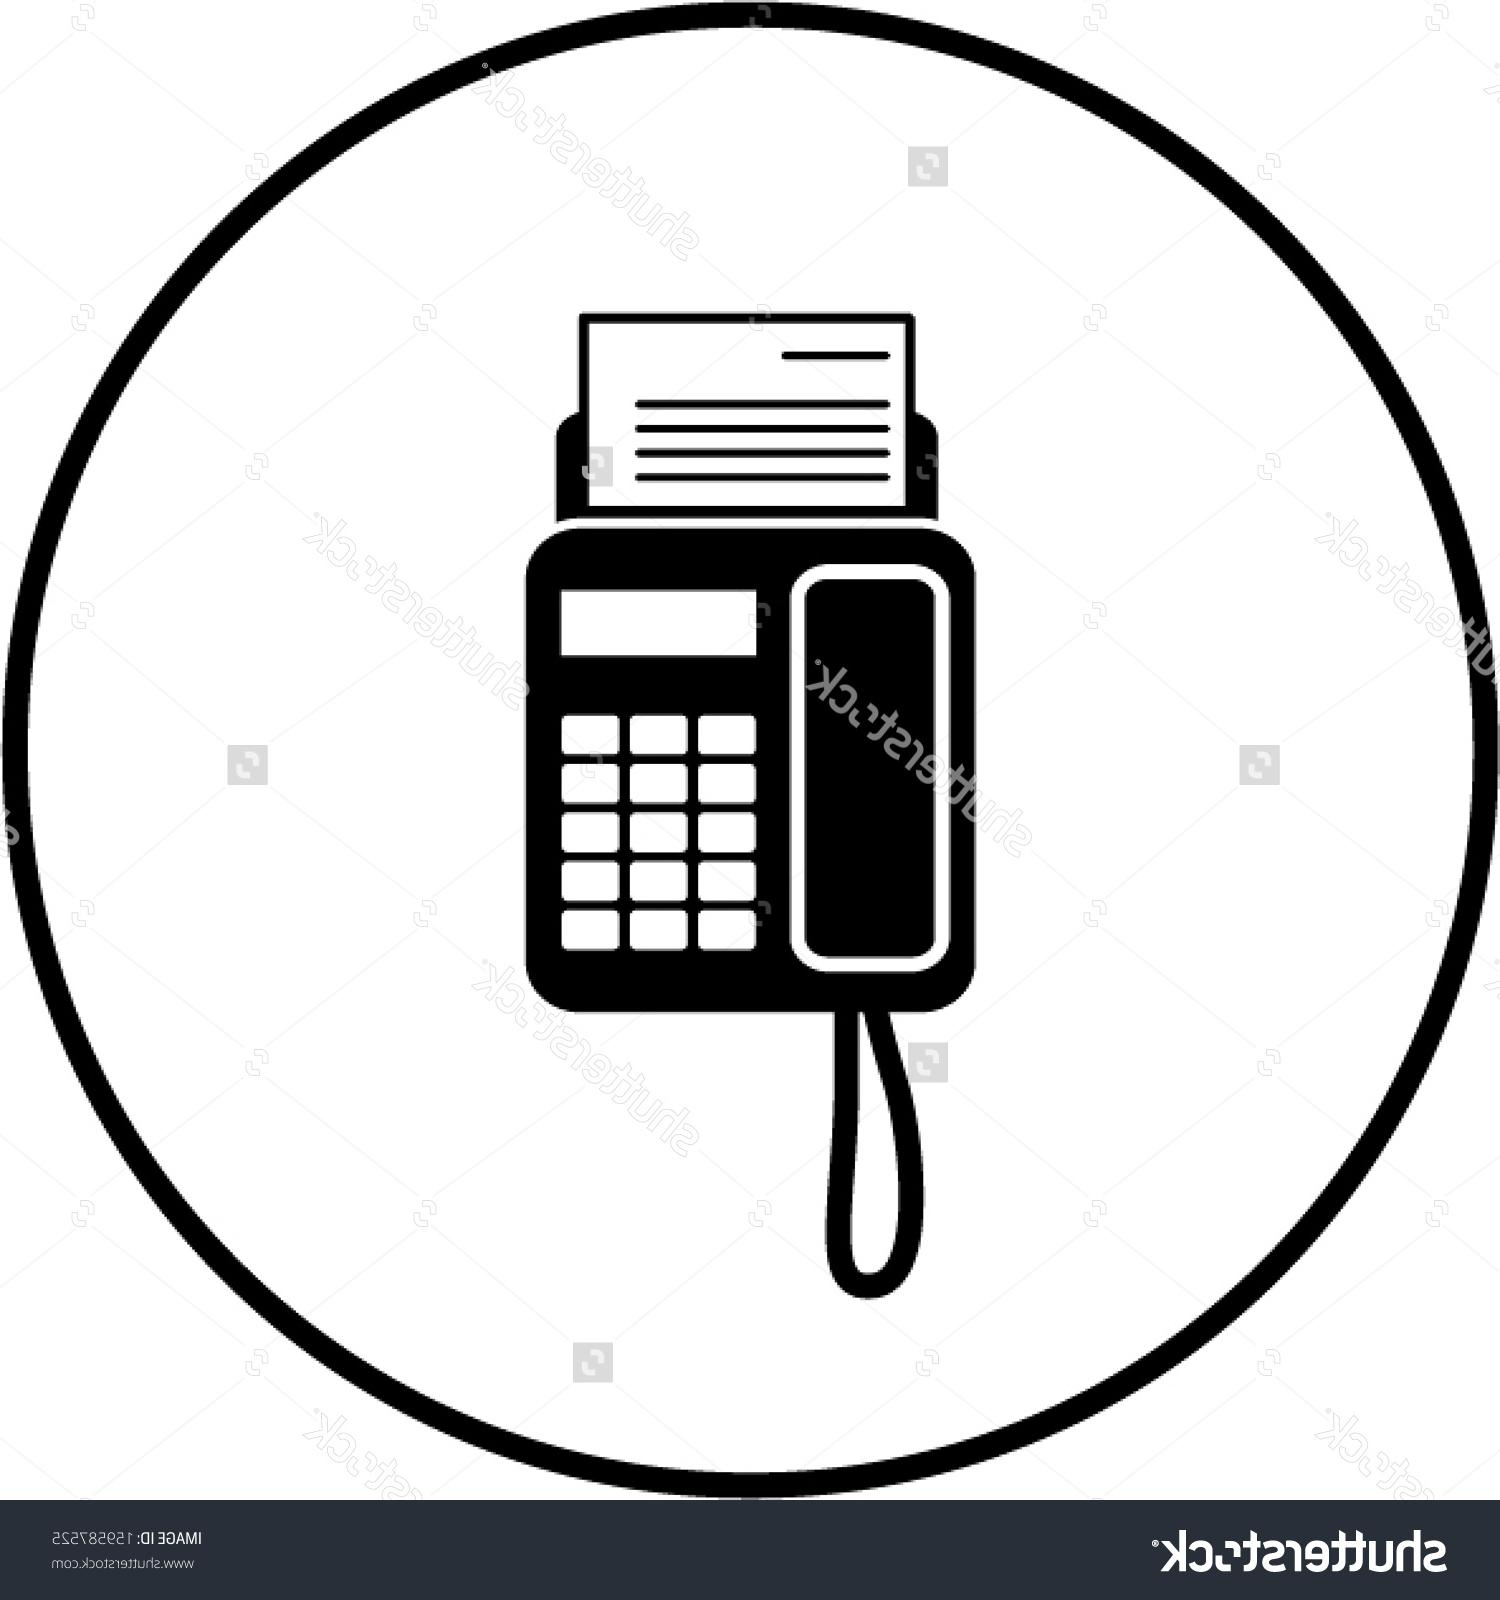 1500x1600 Top 10 Stock Vector Fax Machine Symbol Image